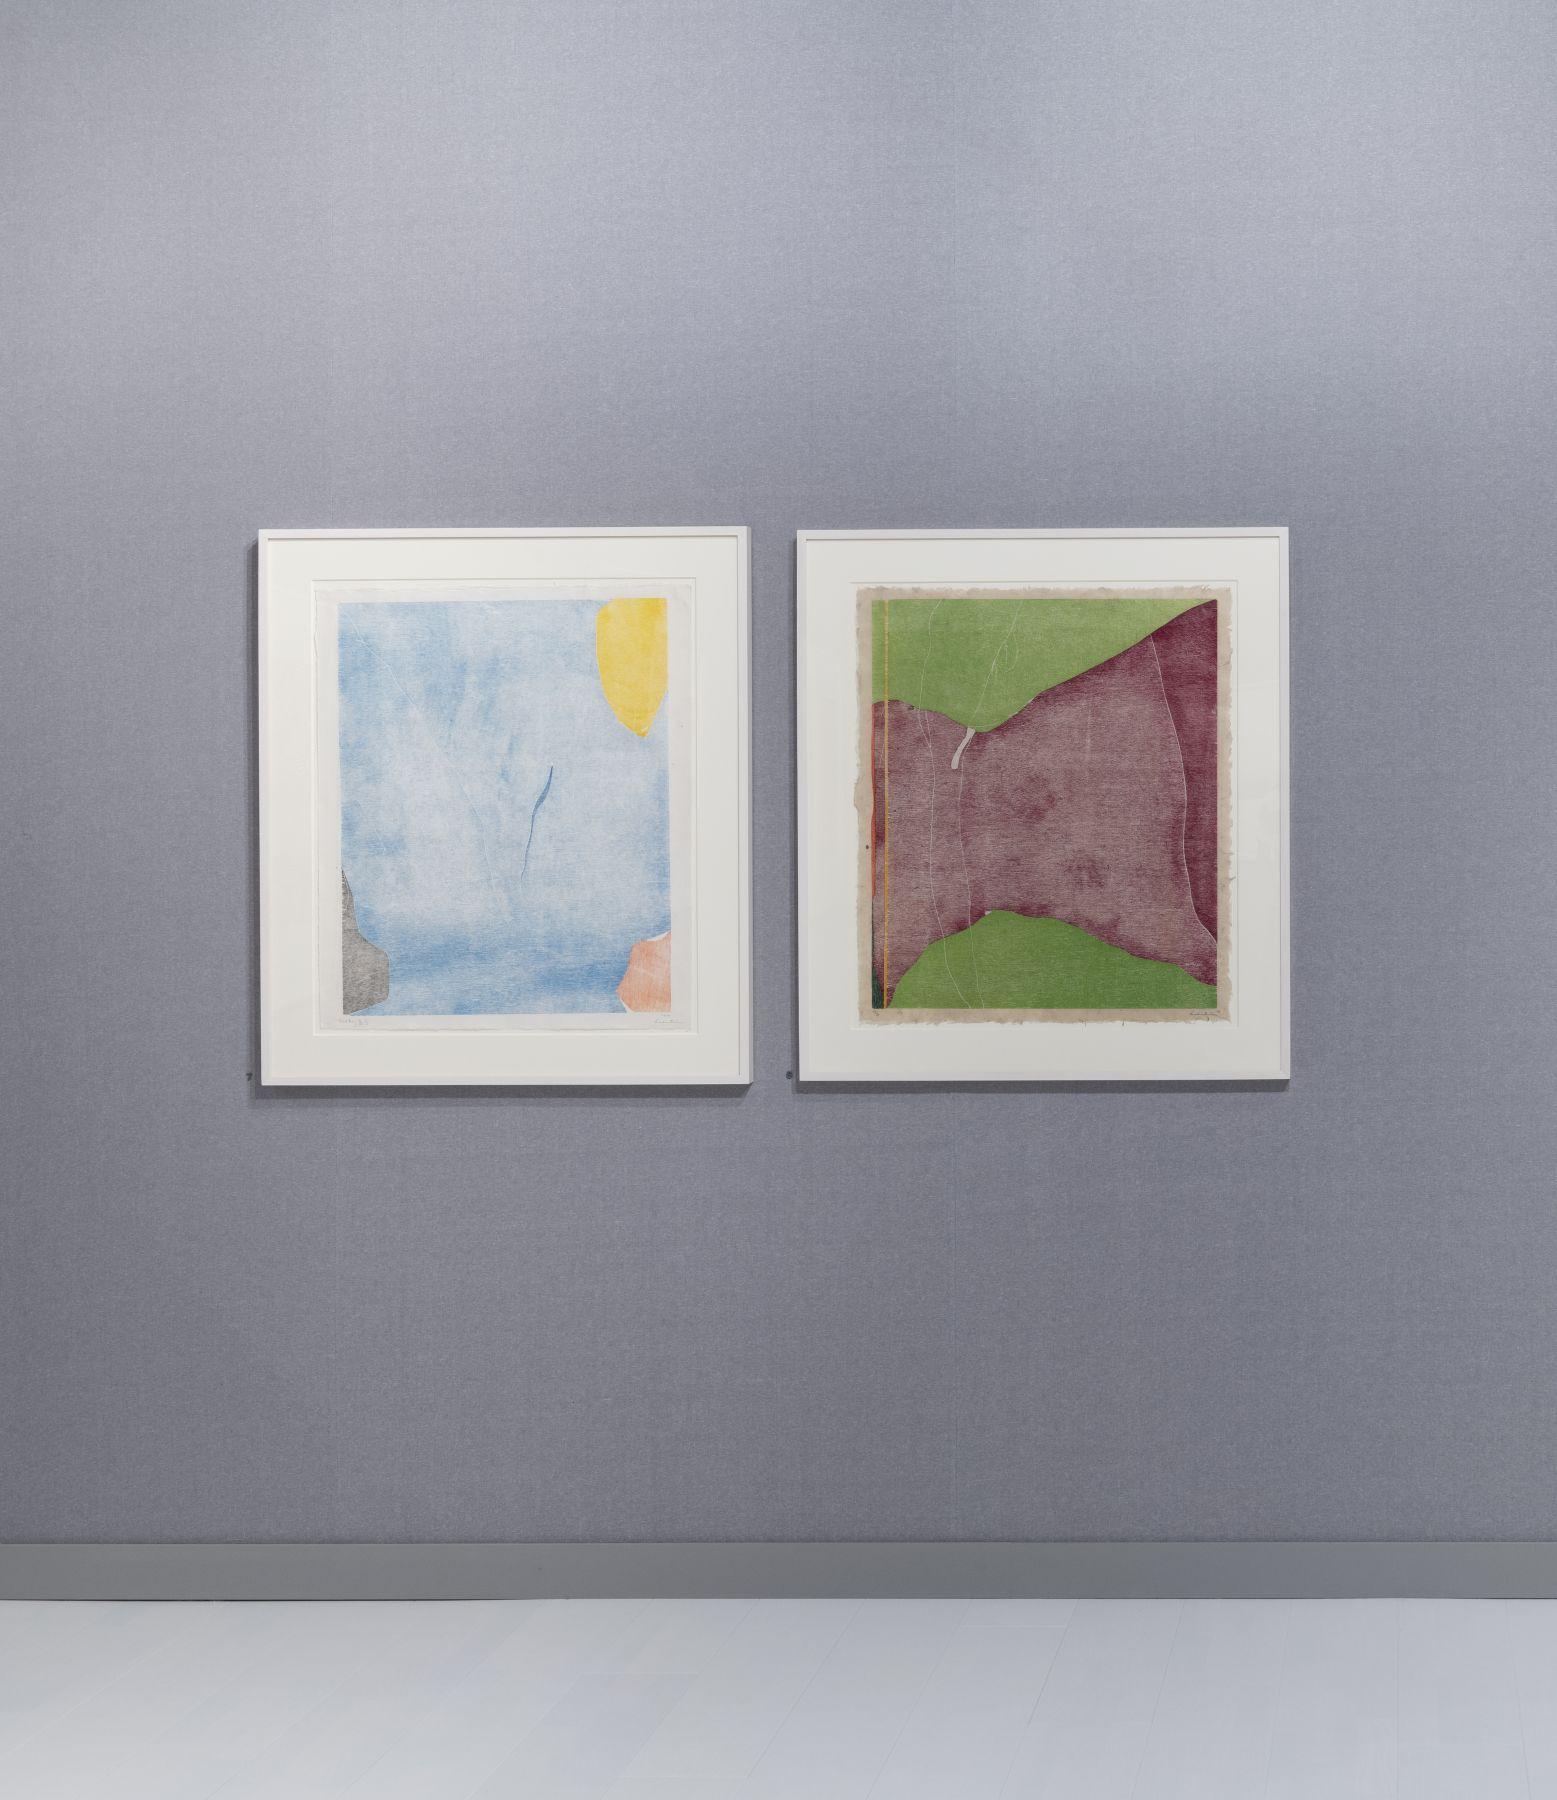 The Art Basel 2019 display at Susan Sheehan Gallery